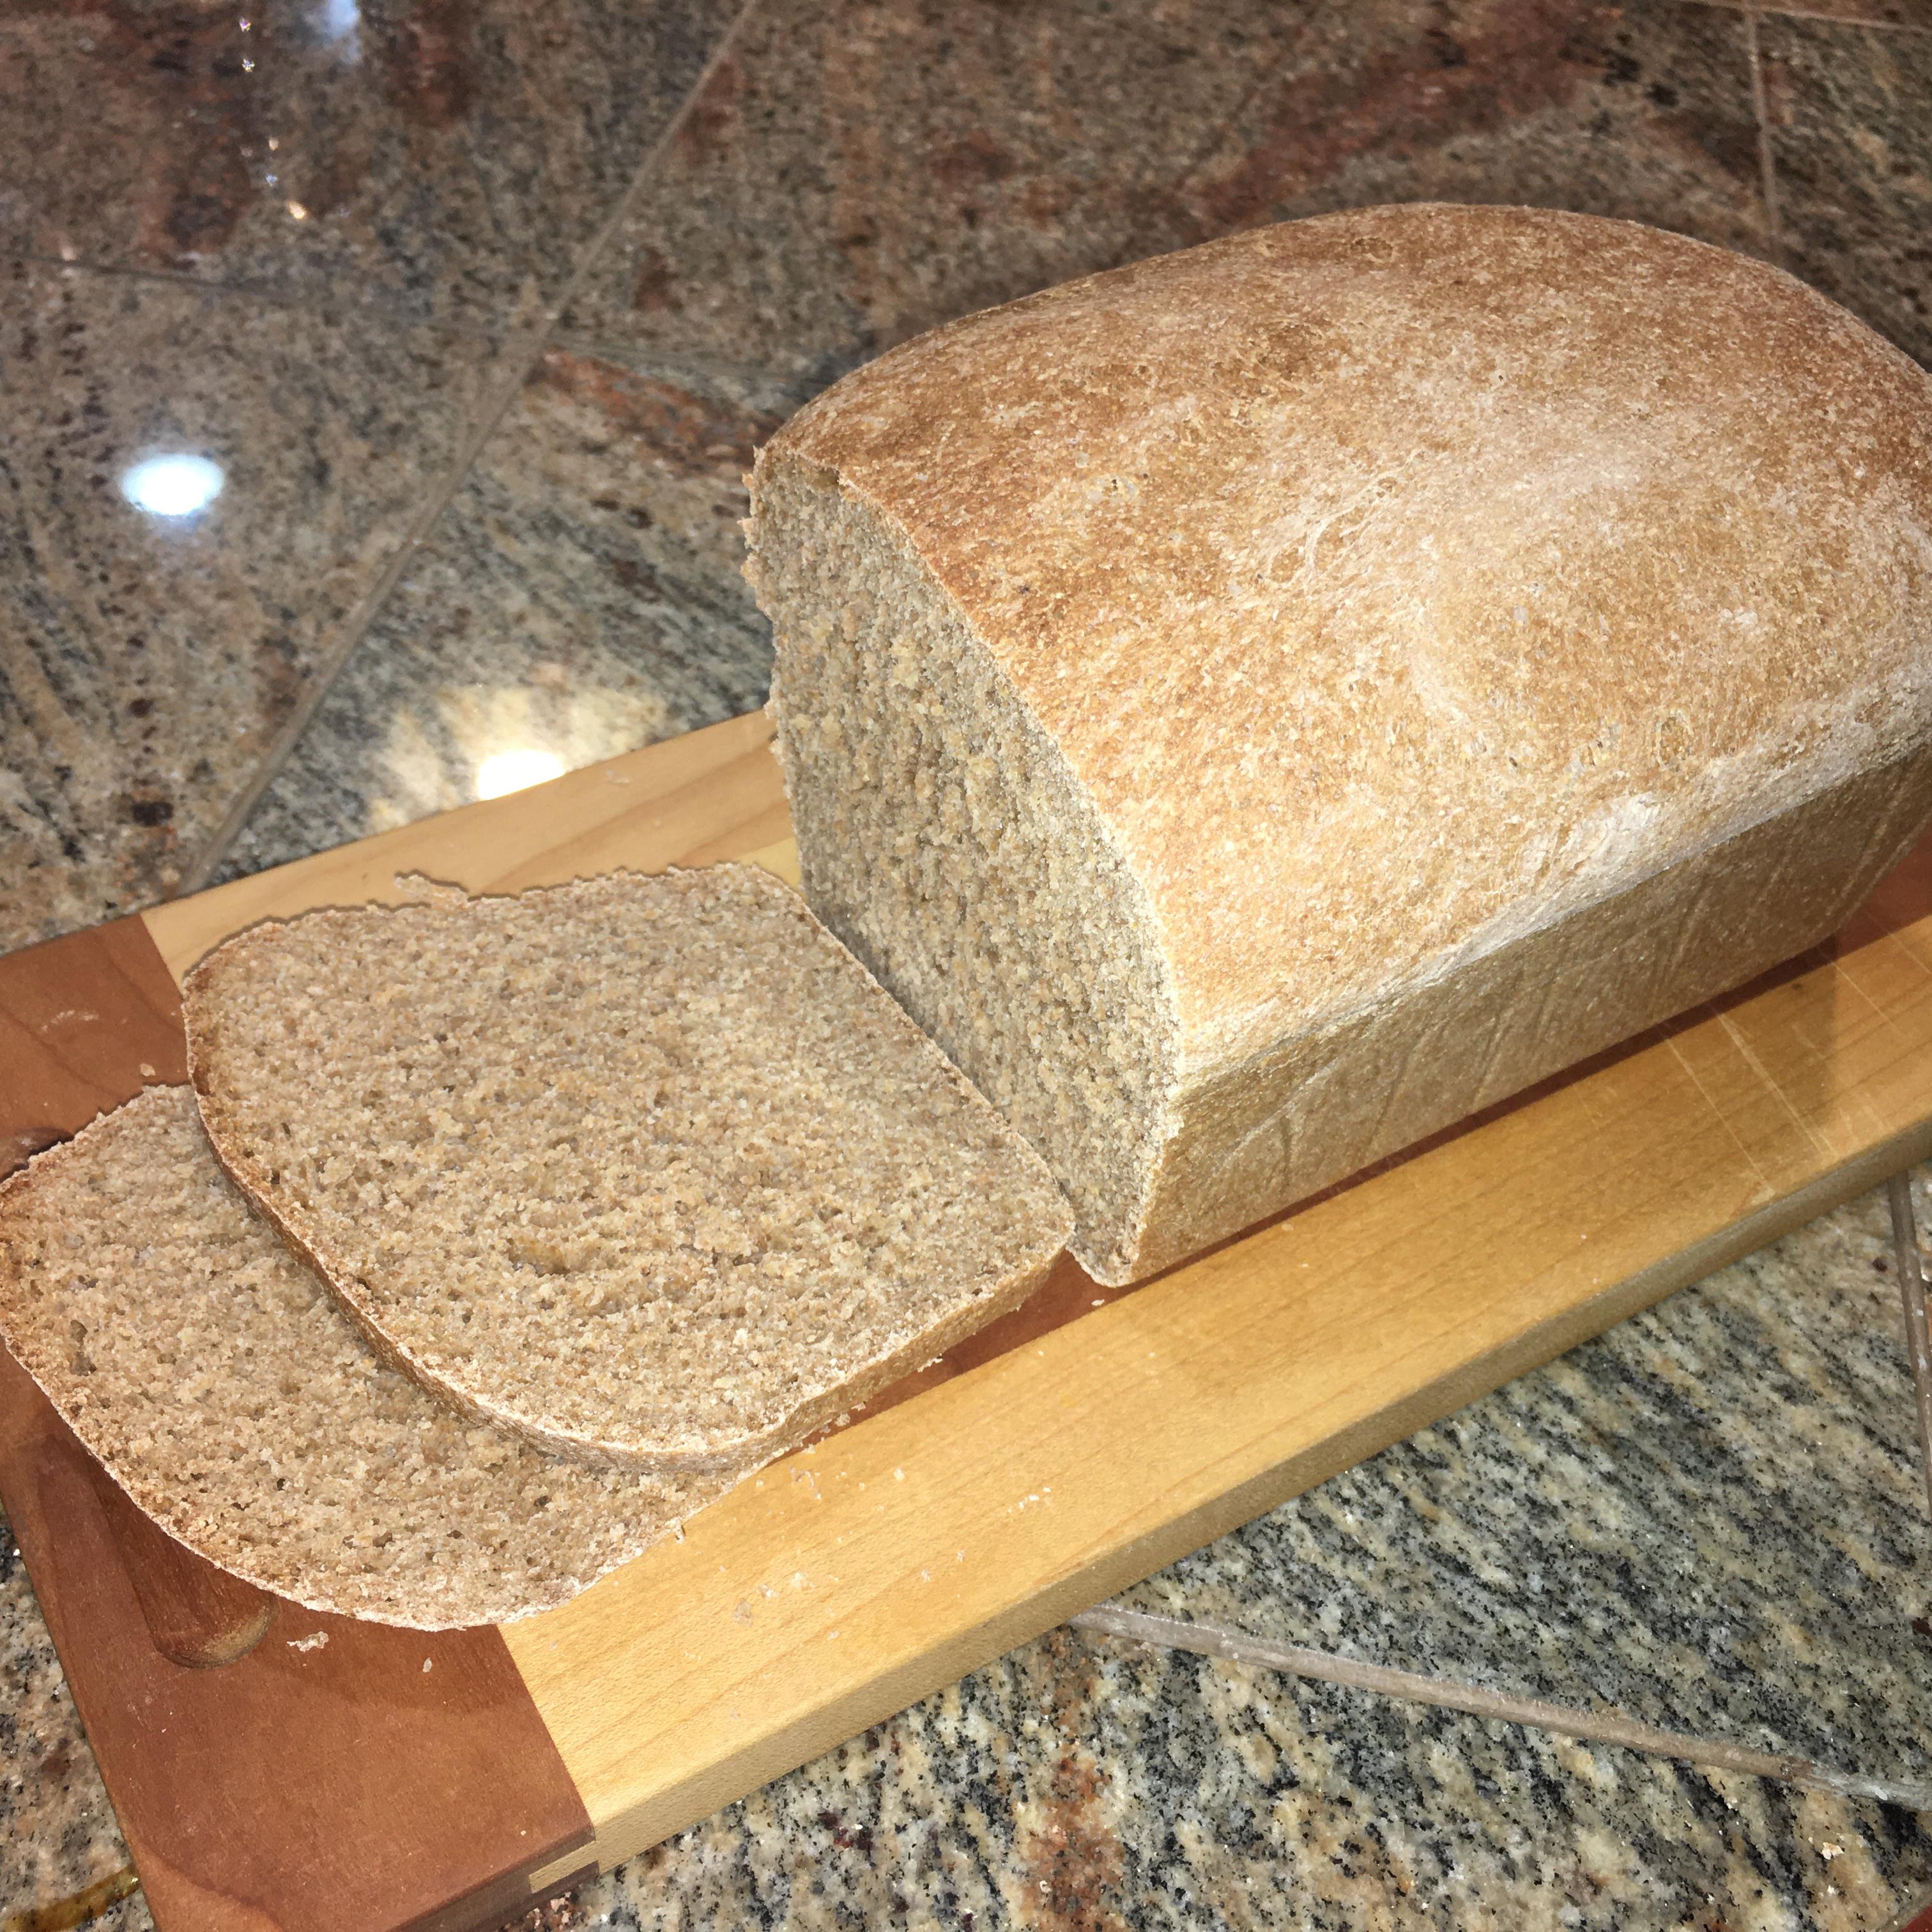 Easy 100% Whole Wheat Bread Fumphco